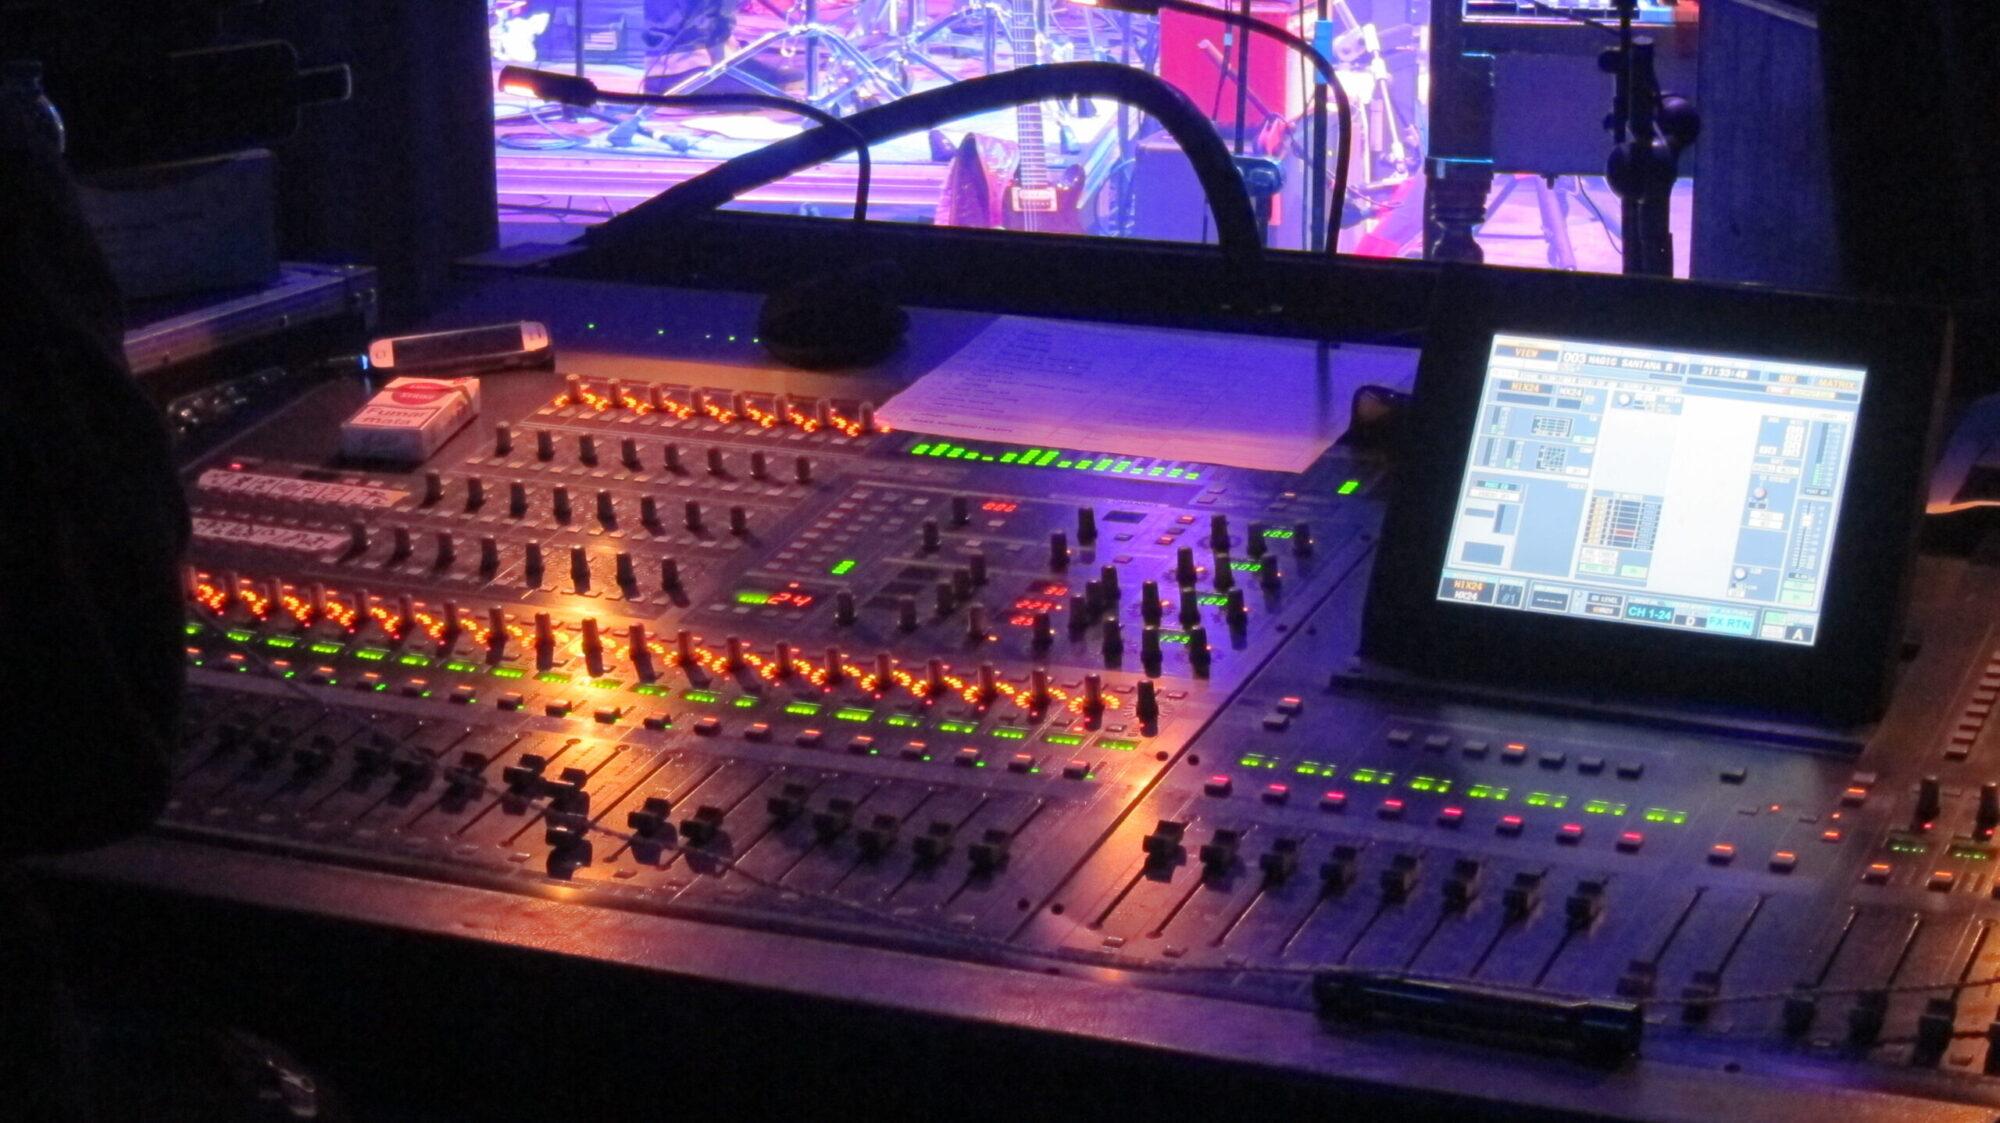 Soundmill Studios